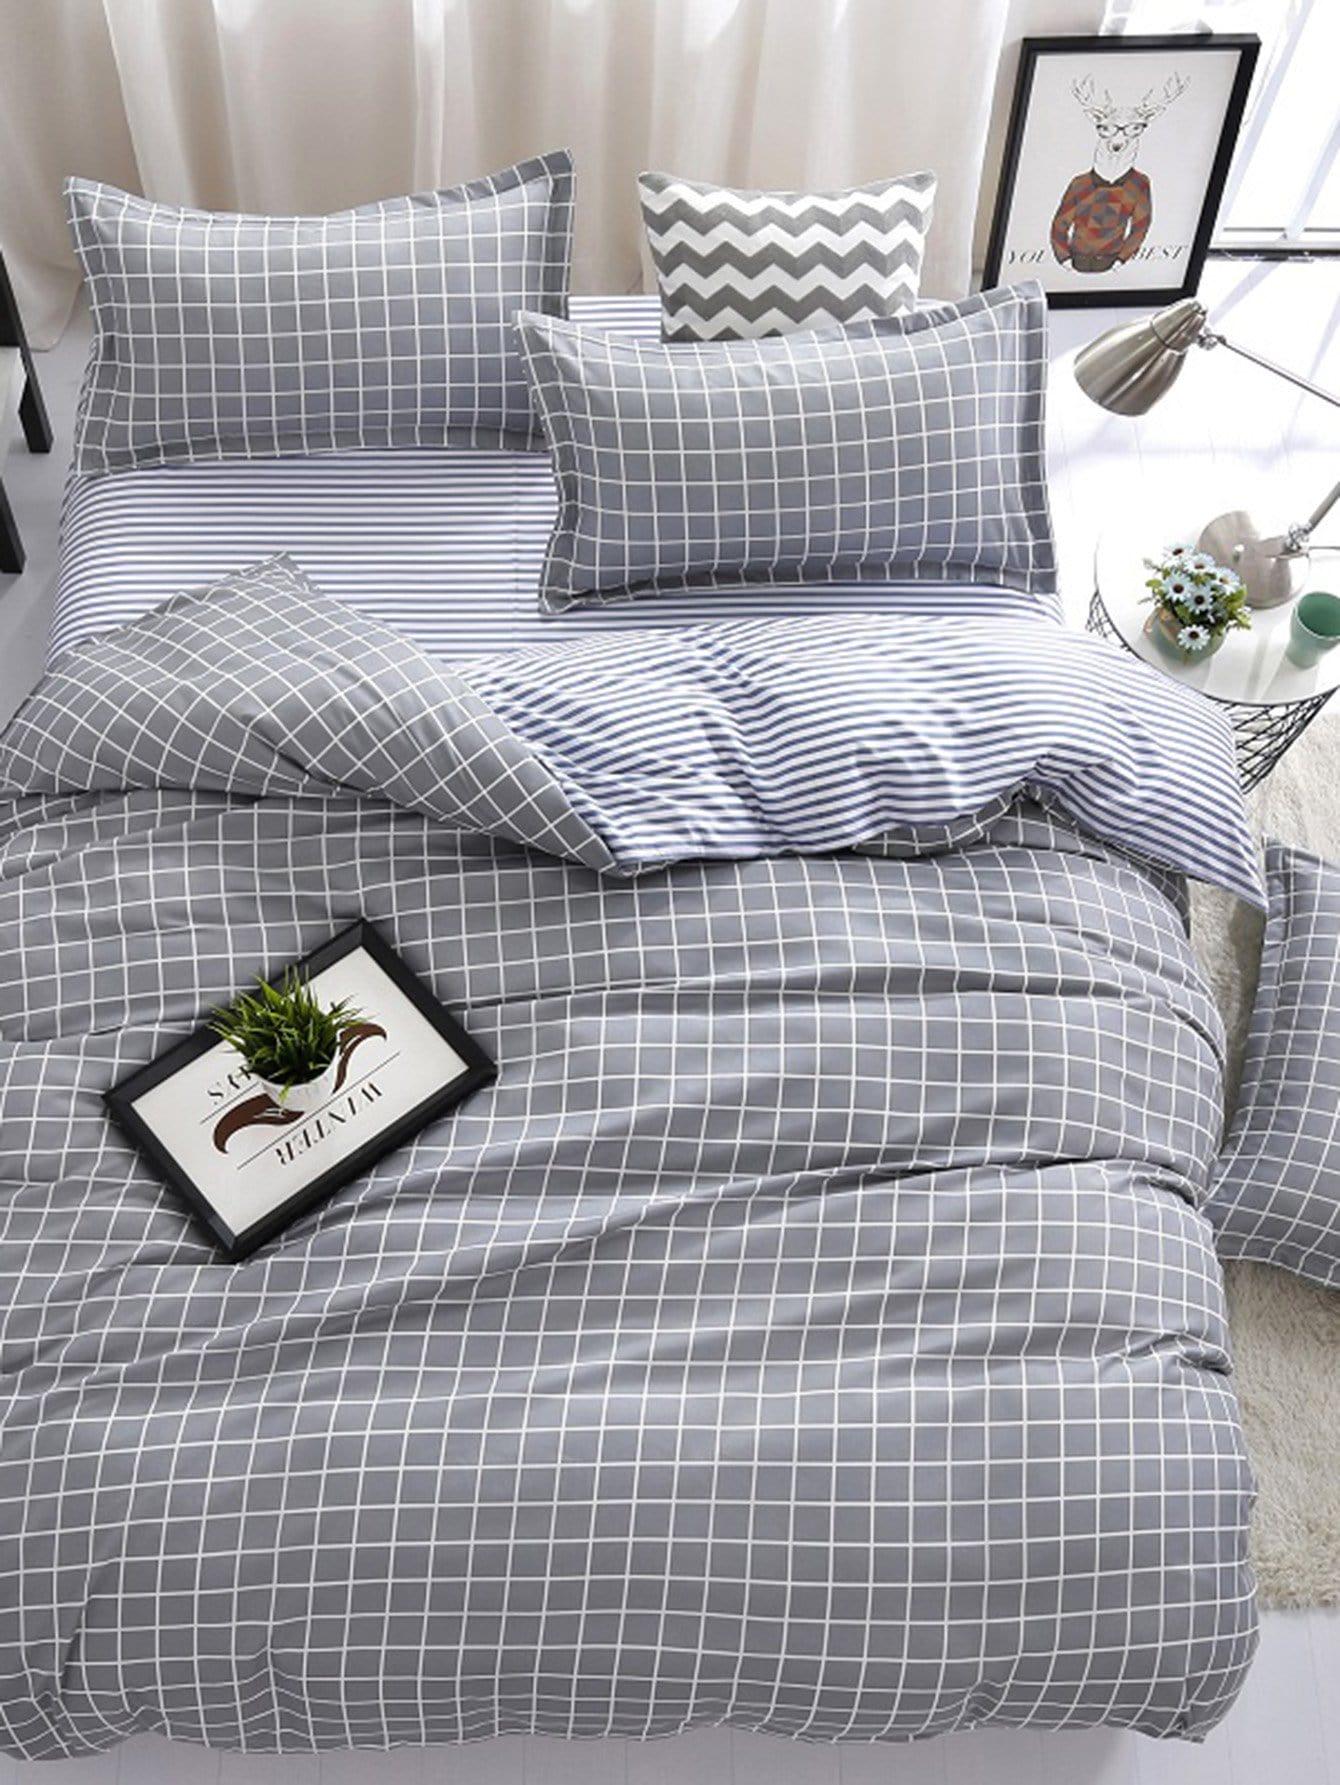 Checked Print Bedding Set heart print bedding set